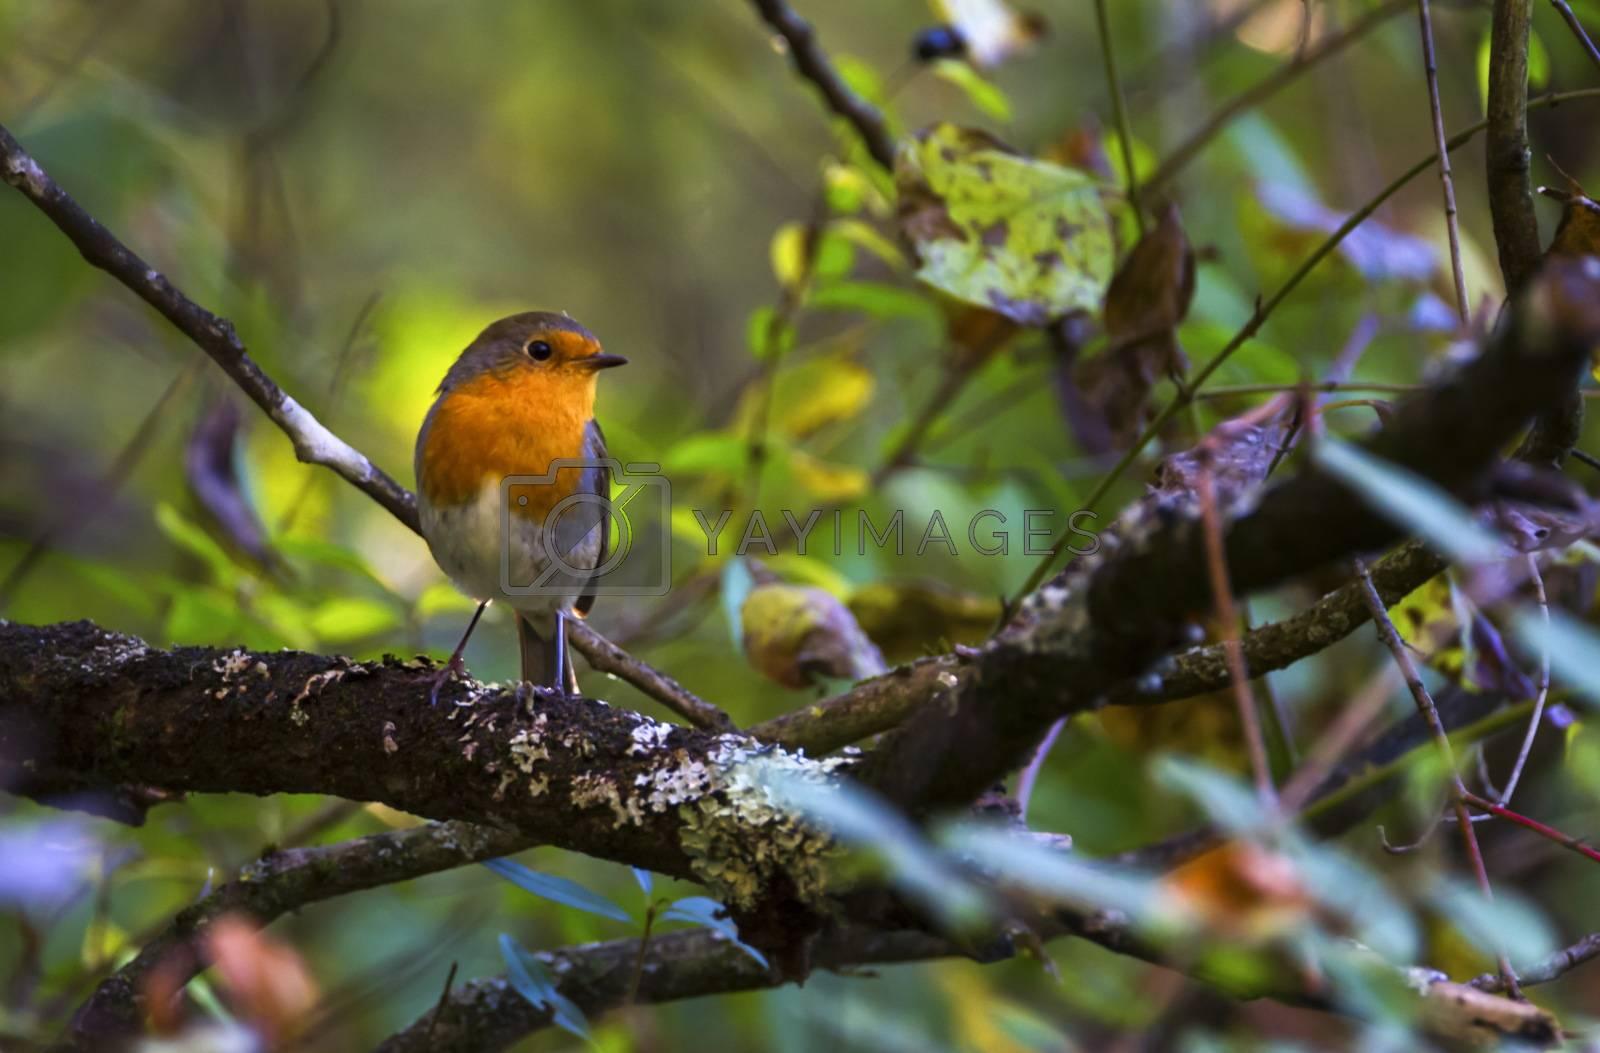 Small european robin, Erithacus rubecula, redbreast on a branch, Geneva, Switzerland